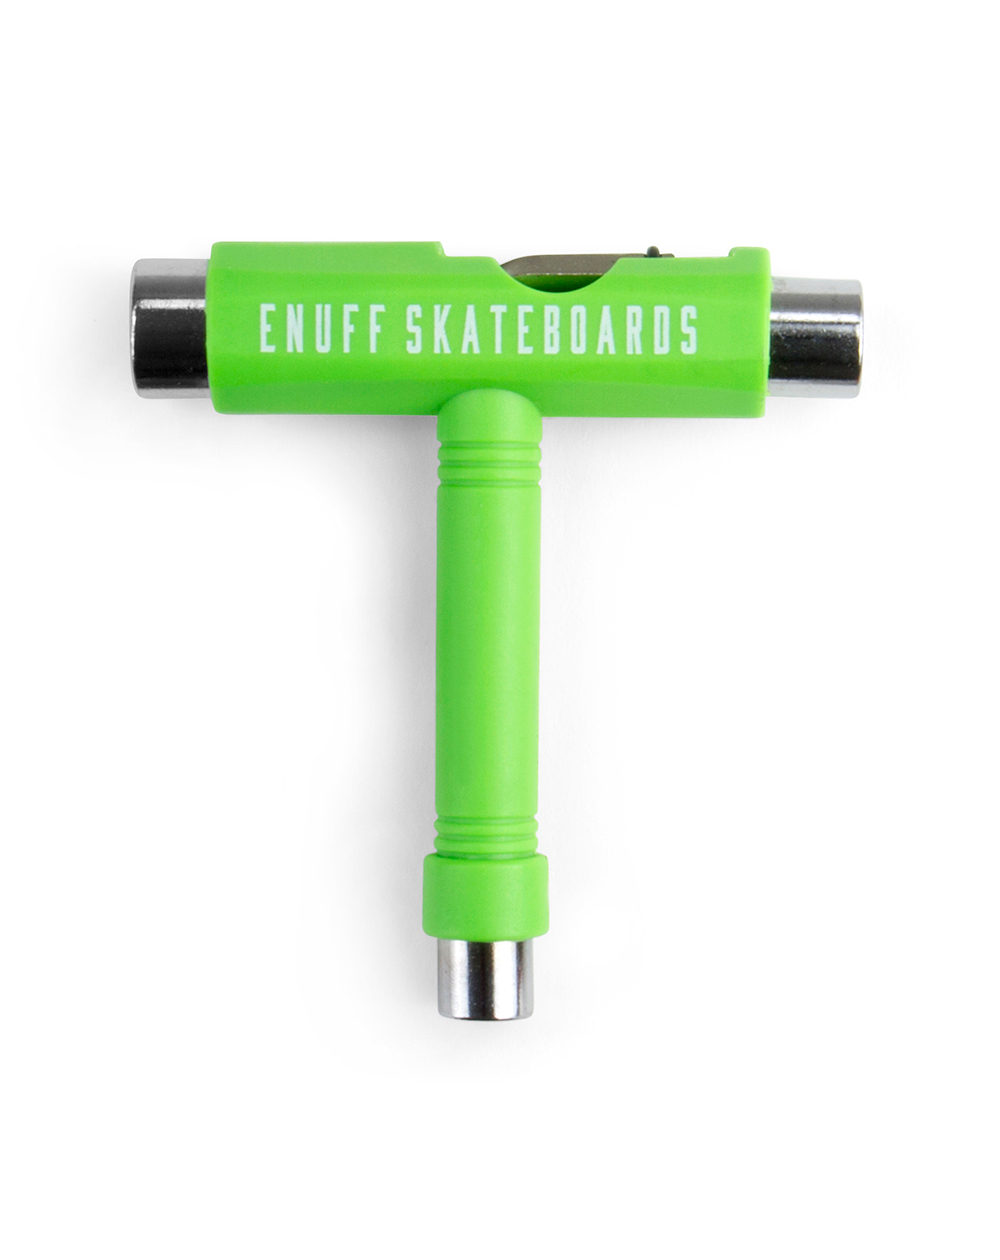 Enuff Clef de Montage Skateboard Essential Tool Green